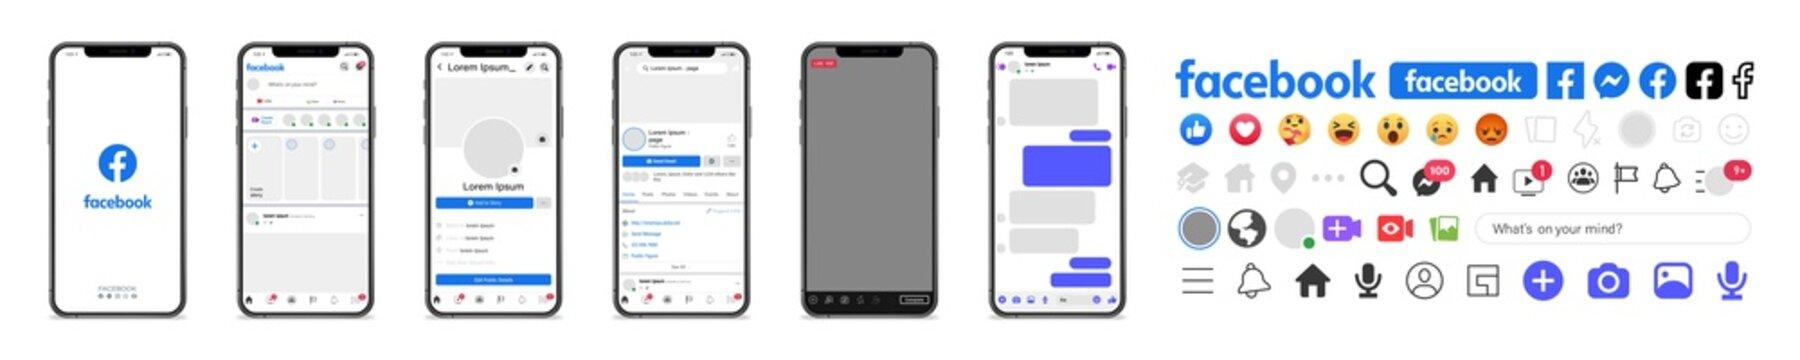 Facebook. Facebook mockup. Facebook mobile App interface template on Apple Iphone mockup. Mockup page template. Editorial vector illustration. Rivne, Ukraine - April 12, 2021